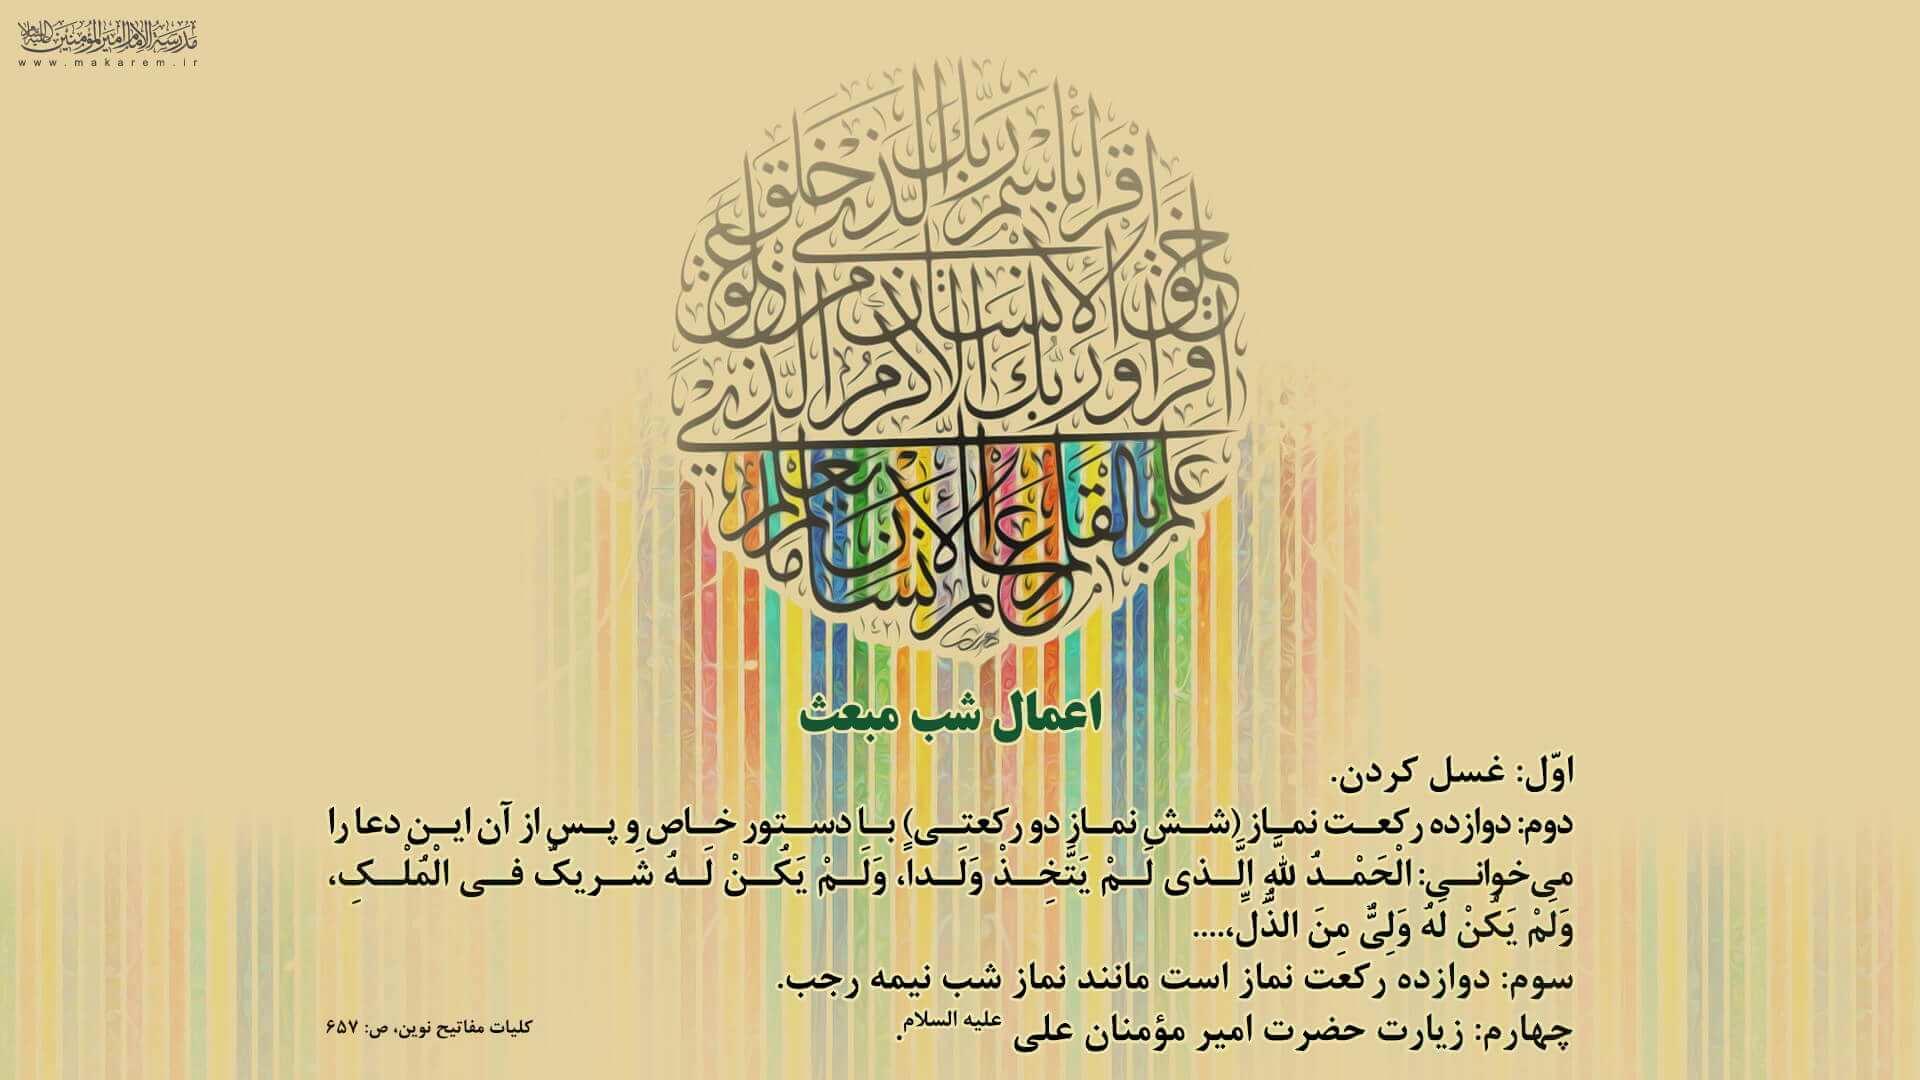 مبعث 01-مدرسه الامام امیر المومنین (ع)